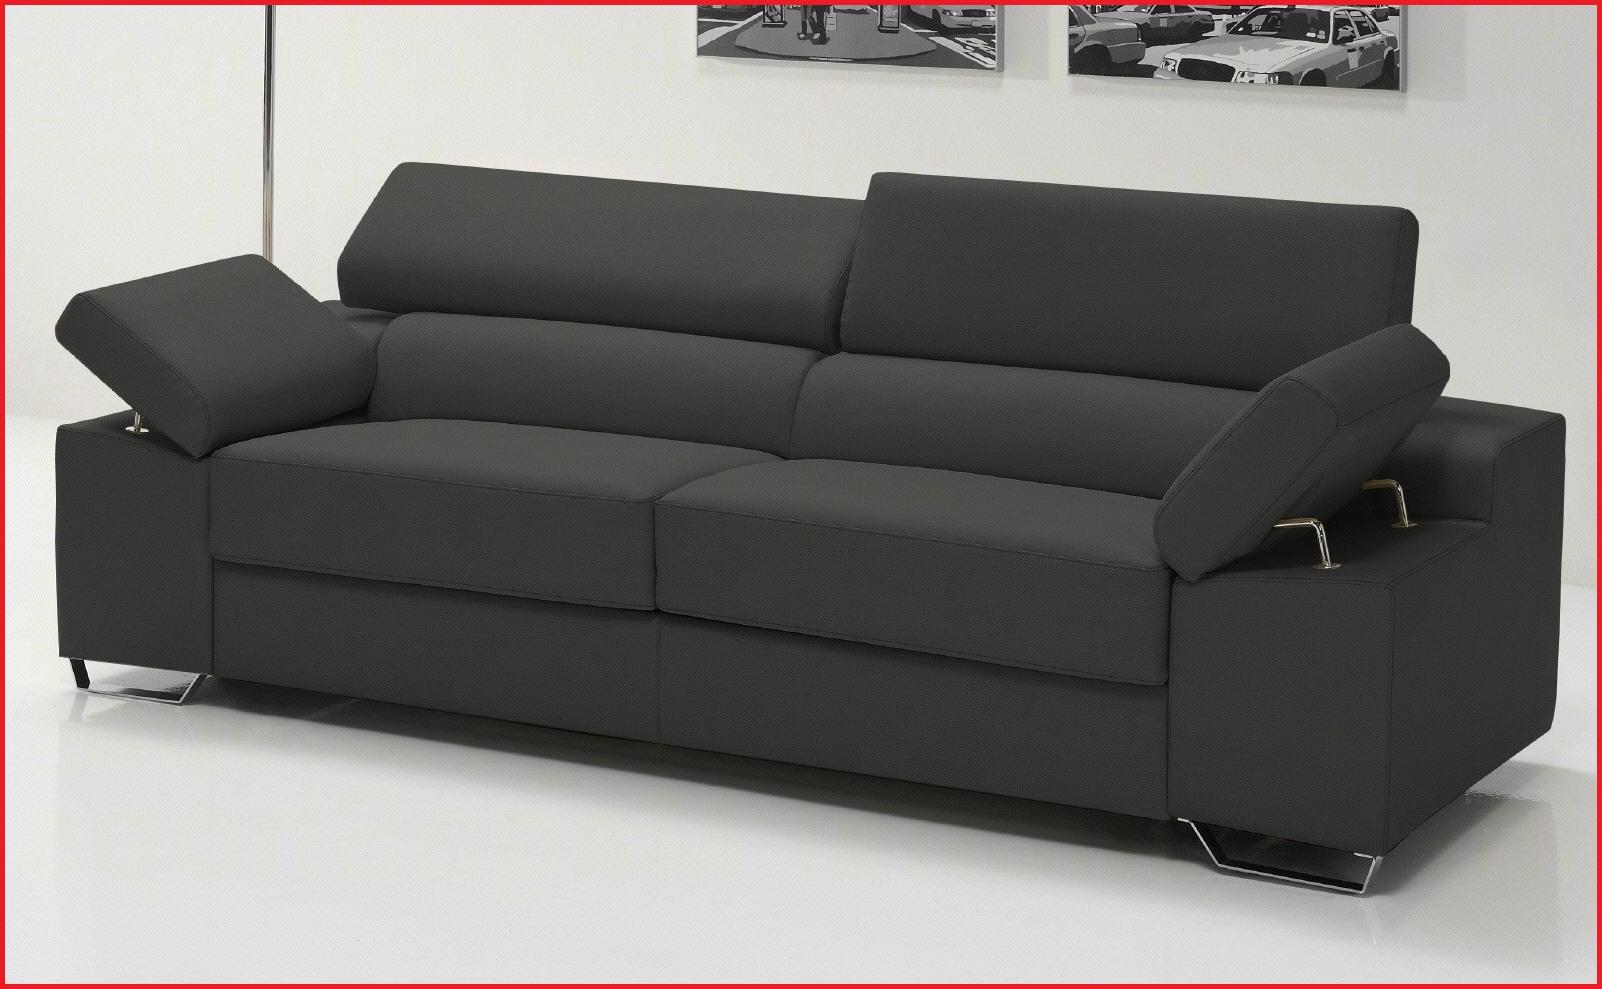 Sofas Baratos Ikea 87dx Bello sofas Precios sofa Cama Baratos Ikea Camas